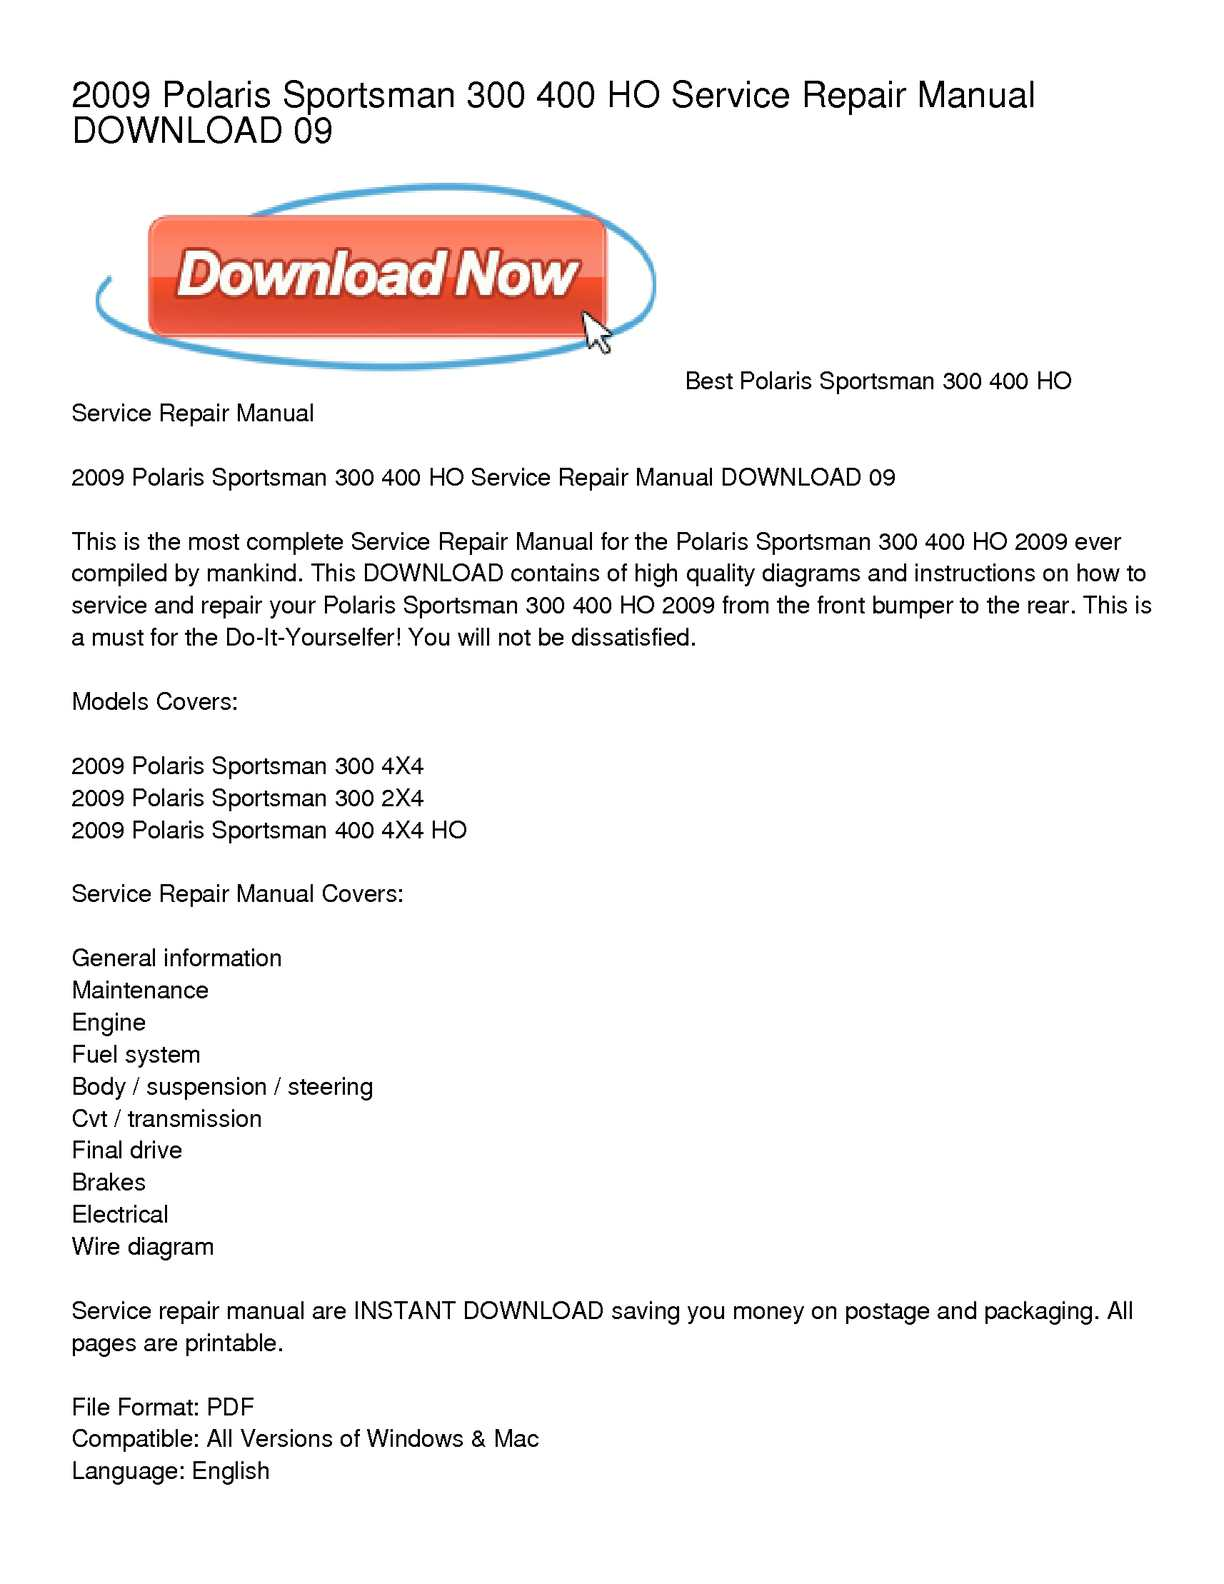 hight resolution of calam o 2009 polaris sportsman 300 400 ho service repair manual download 09